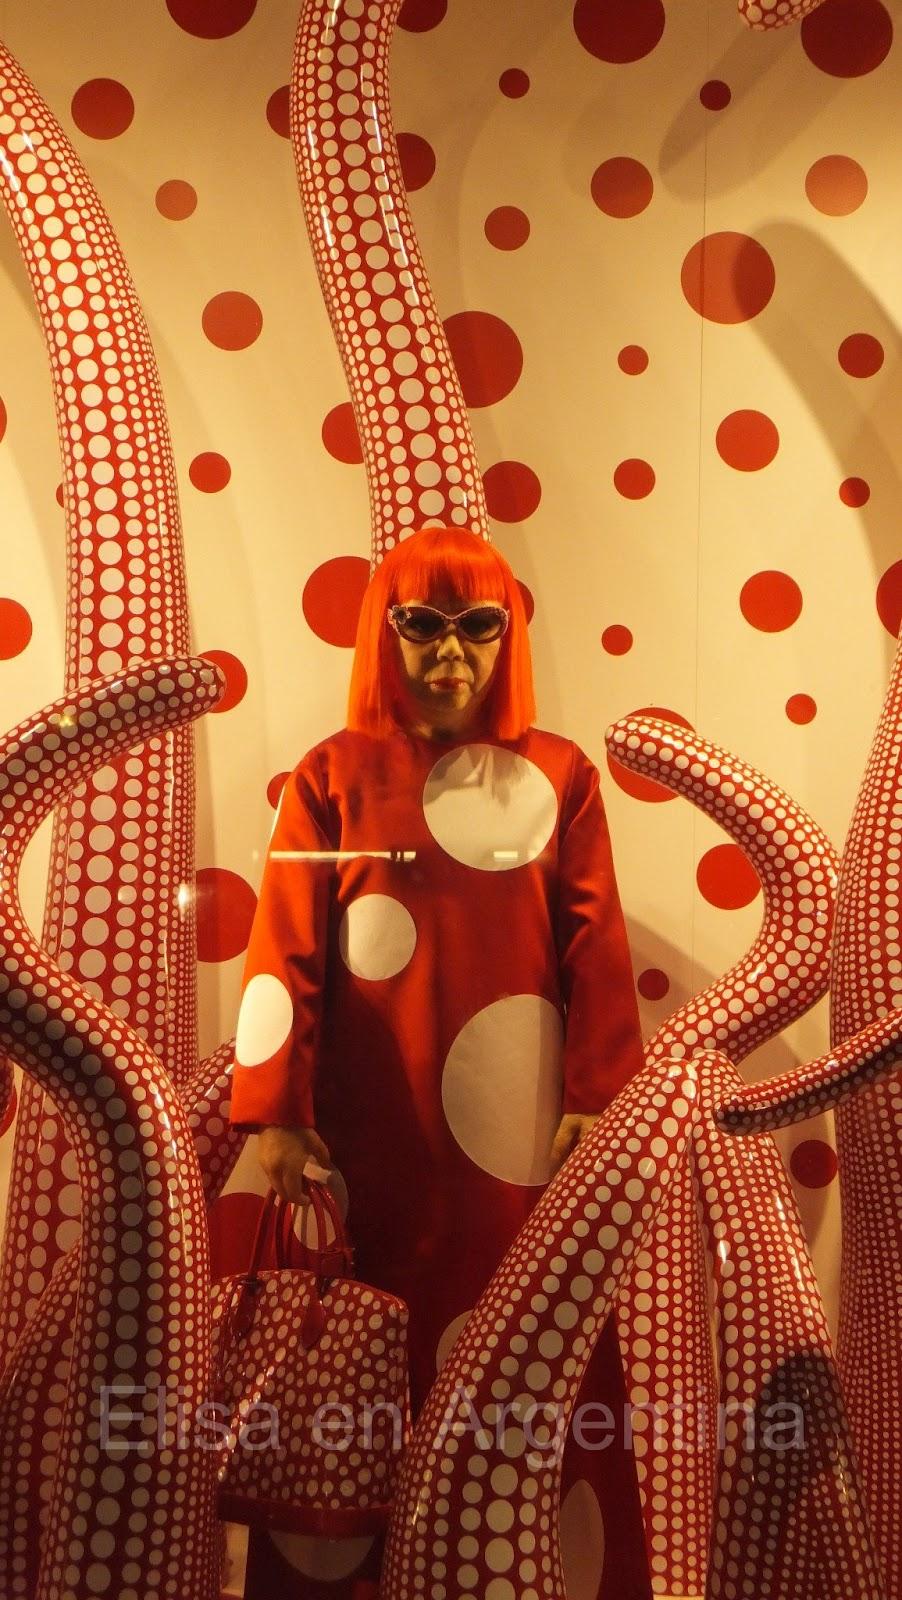 Dots Infinity de Yayoi Kusama, Vuitton Quinta Avenida